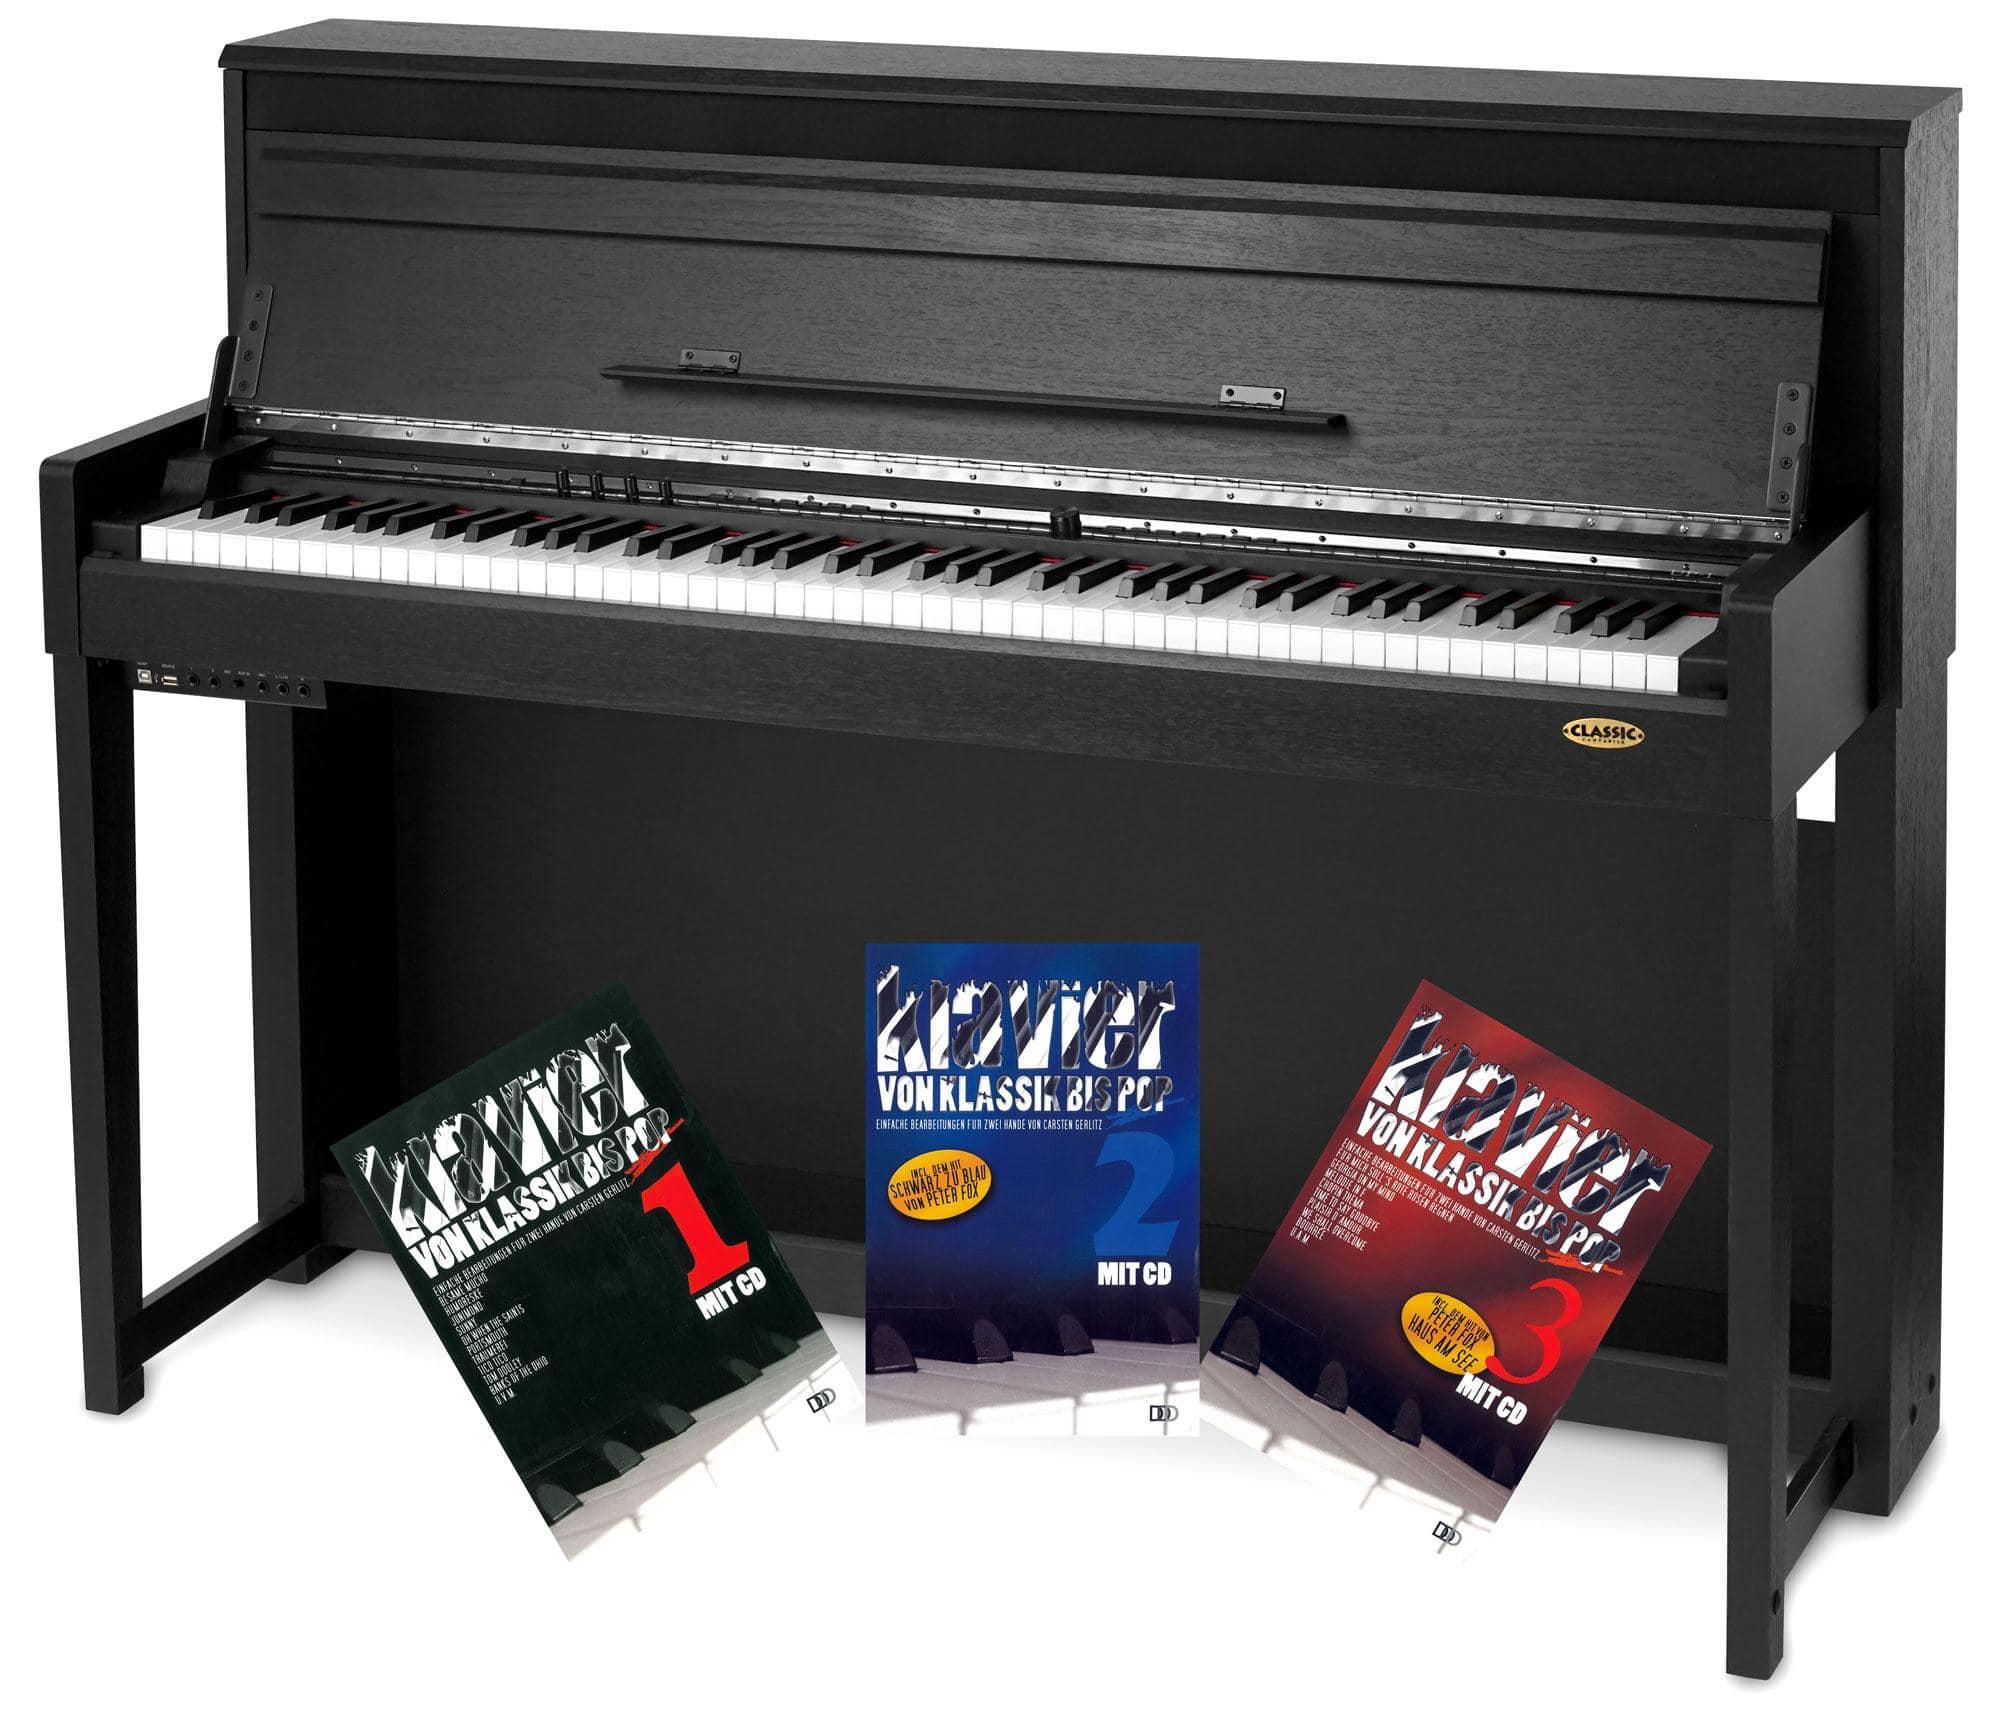 Classic Cantabile UP 1 SM Upright E Piano Schwarz matt Klavierschule Set